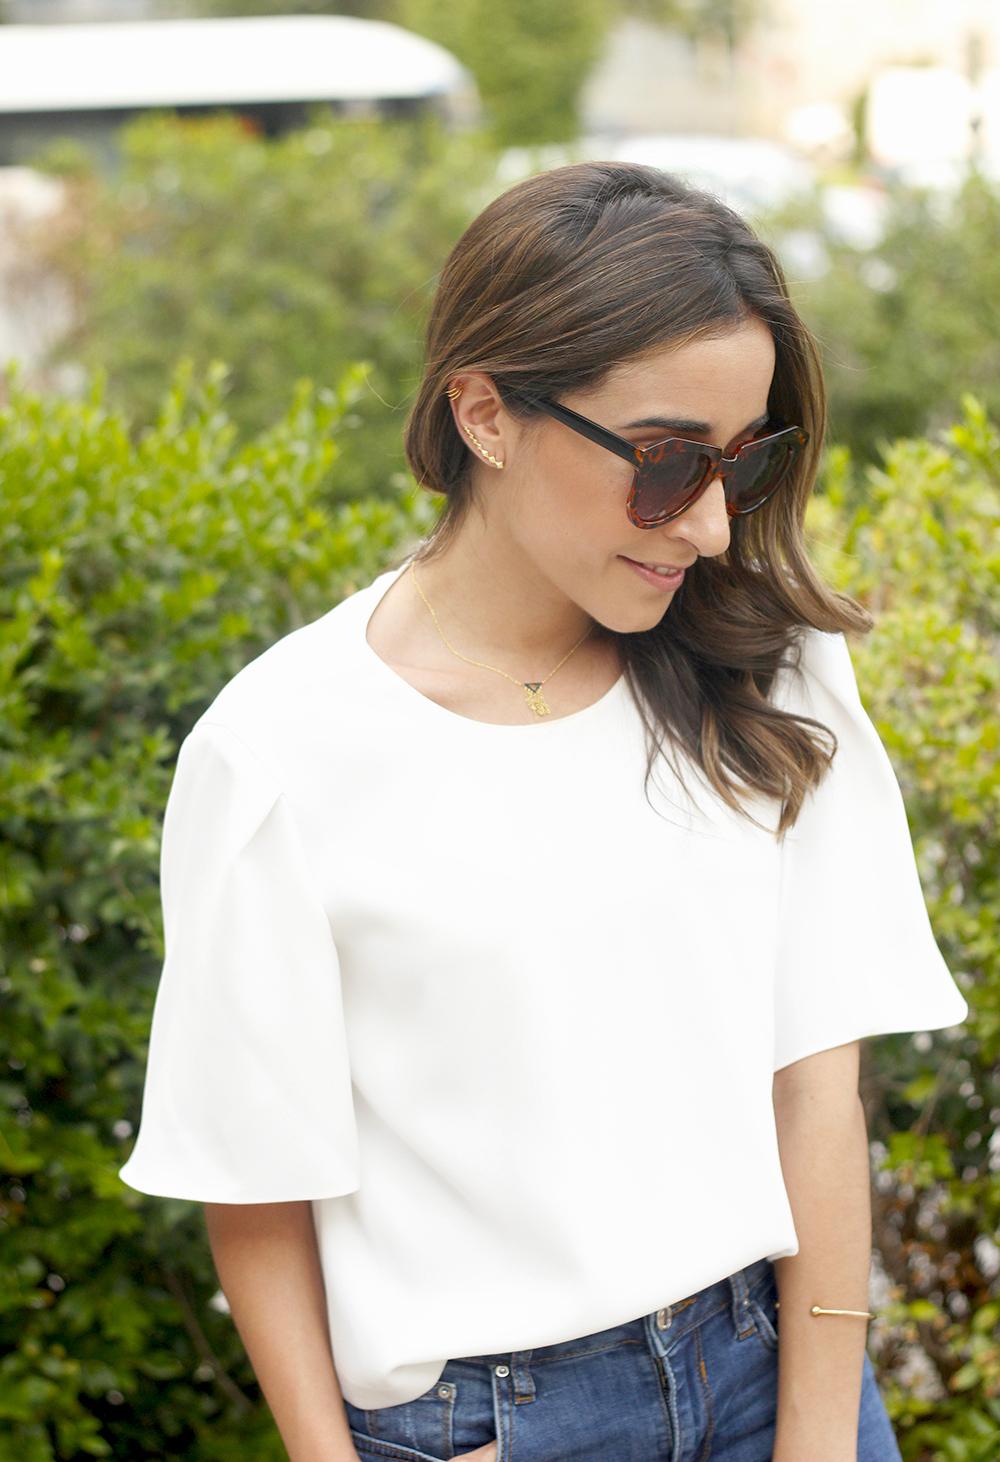 White blouse jeans earrings earcuff jewellery corte ingles joyería verano summer outfit style3